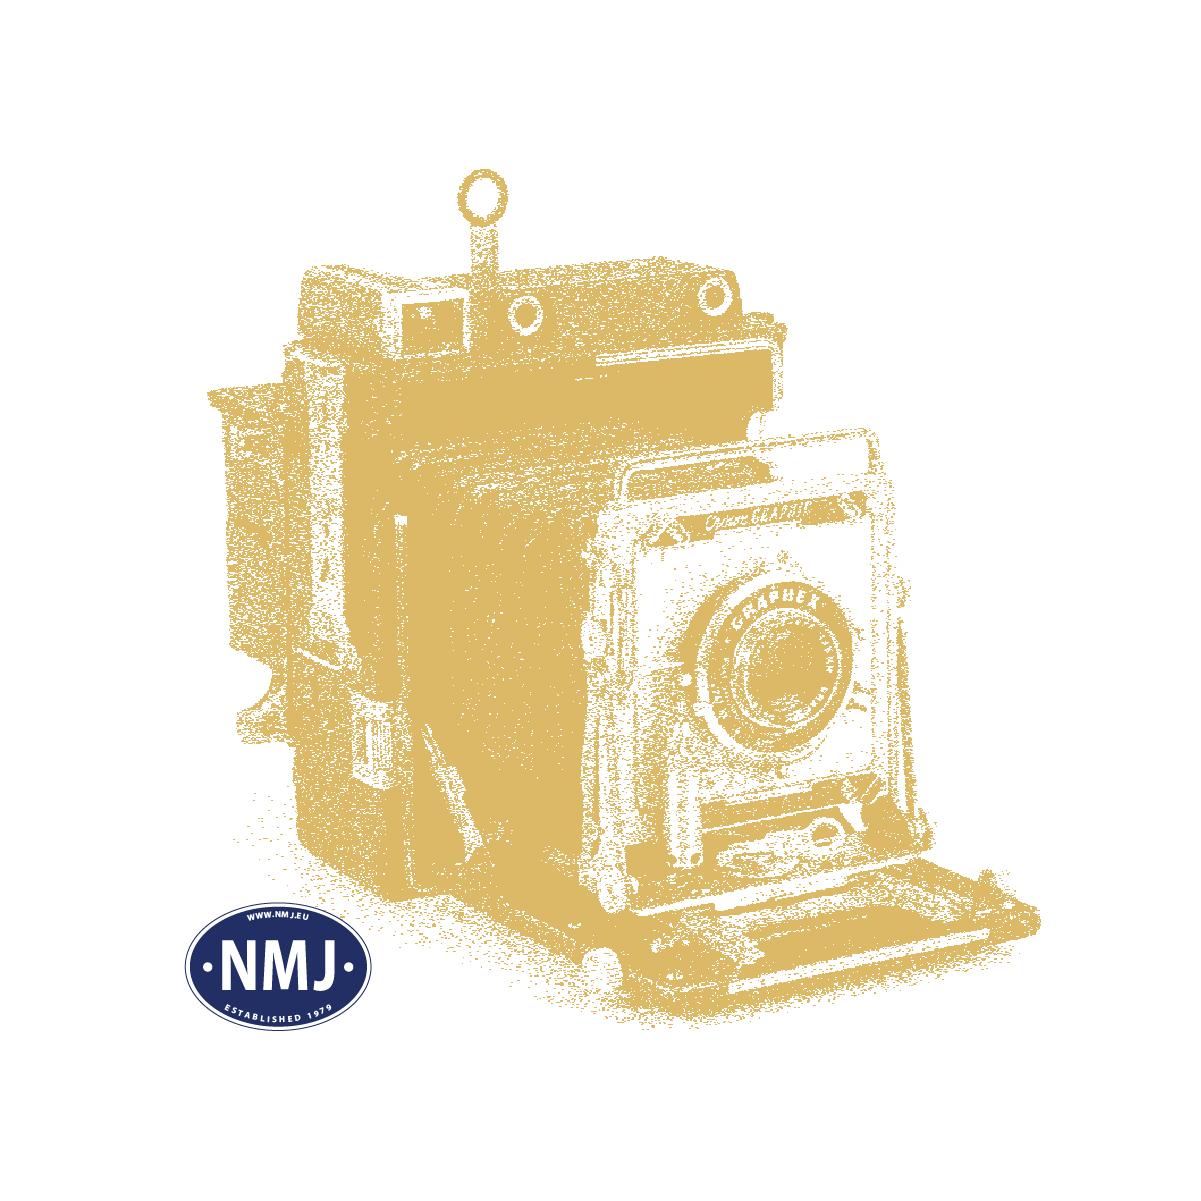 NOC60150 - Vannpumpe, Elektrisk